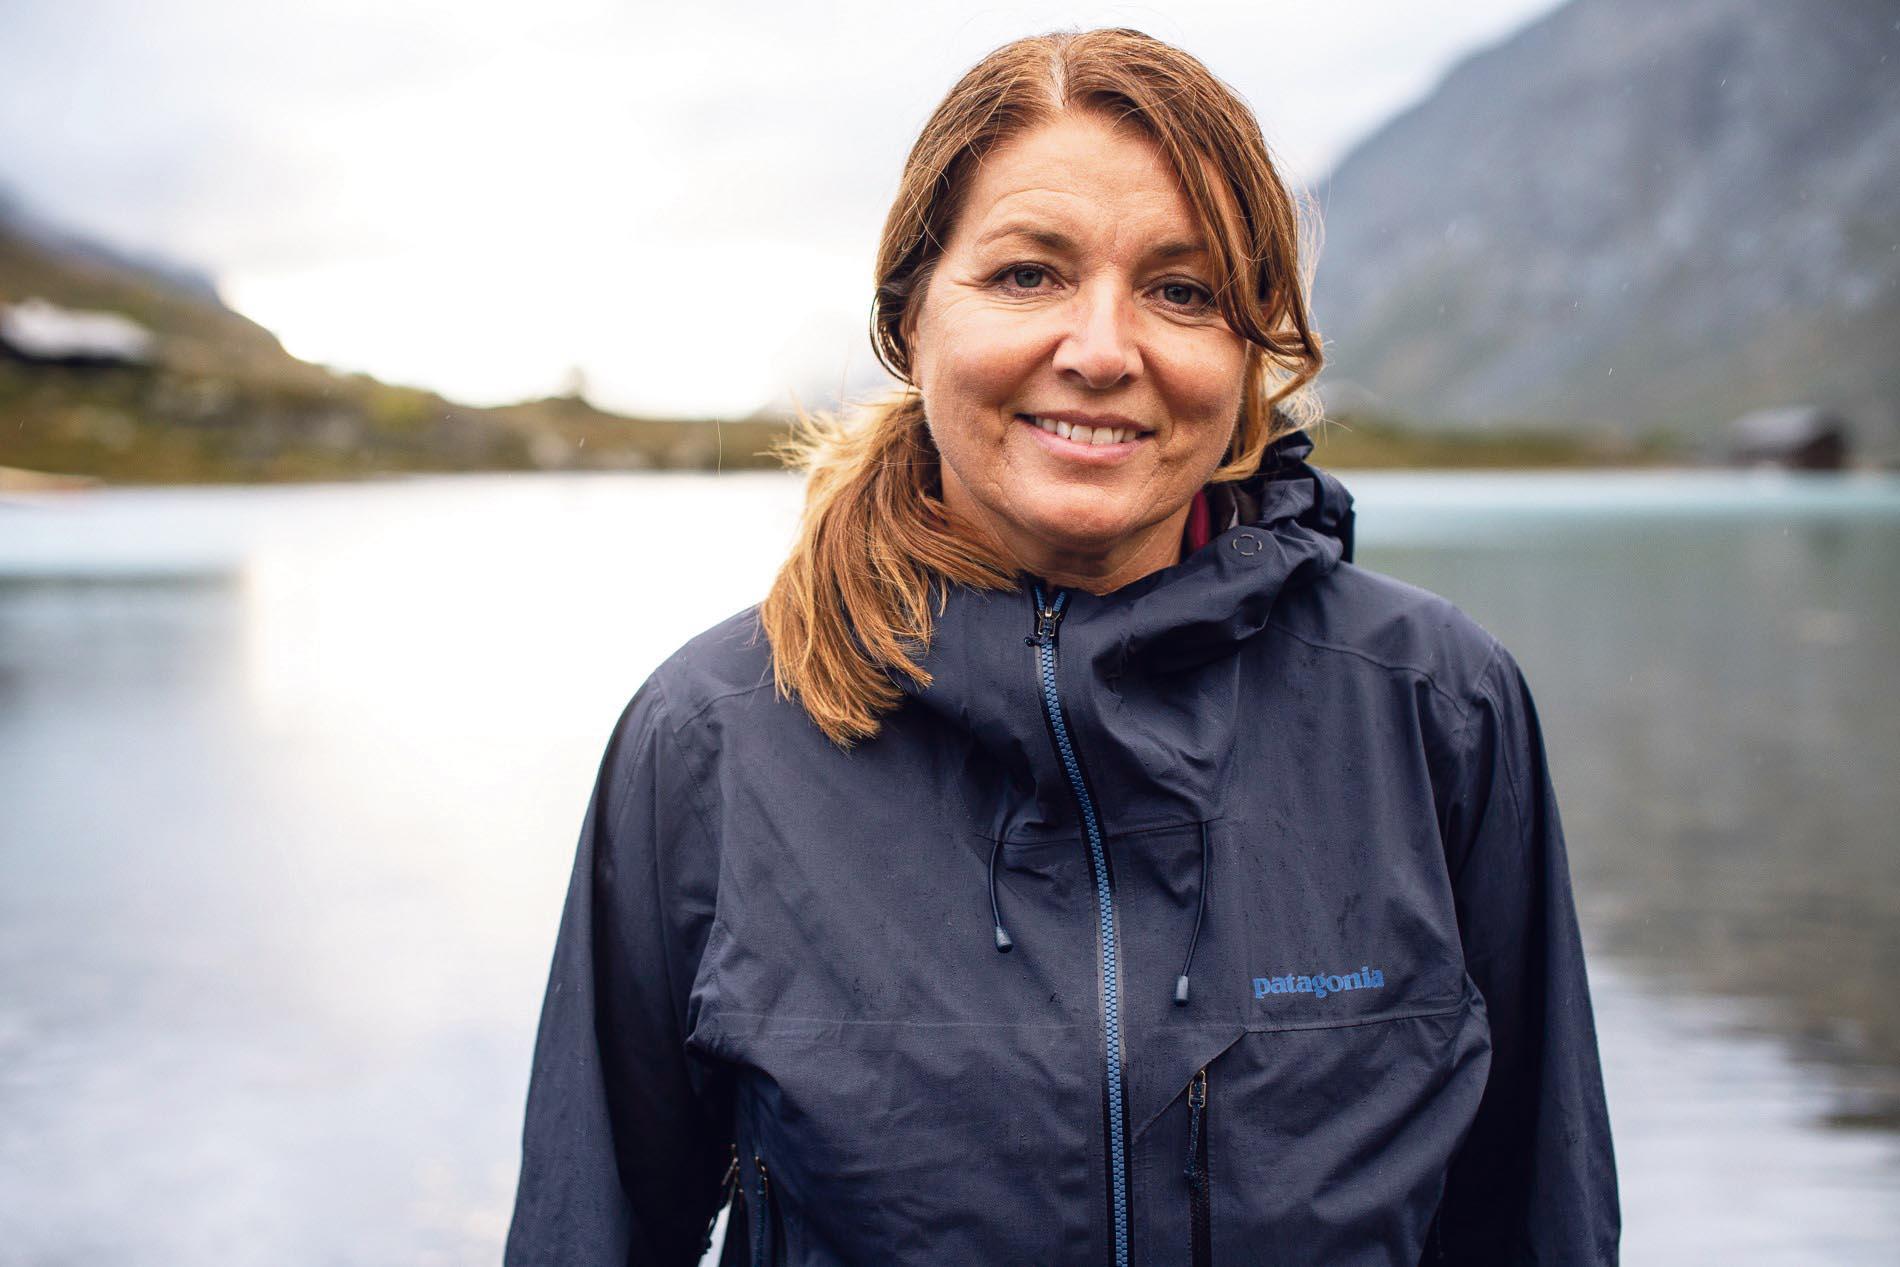 TIL SYDPOLEN: Astrid Furholt Fra Kristiansand Har Gått I Roald Amundsens Fotspor. Foto: Christian Nerdrum.